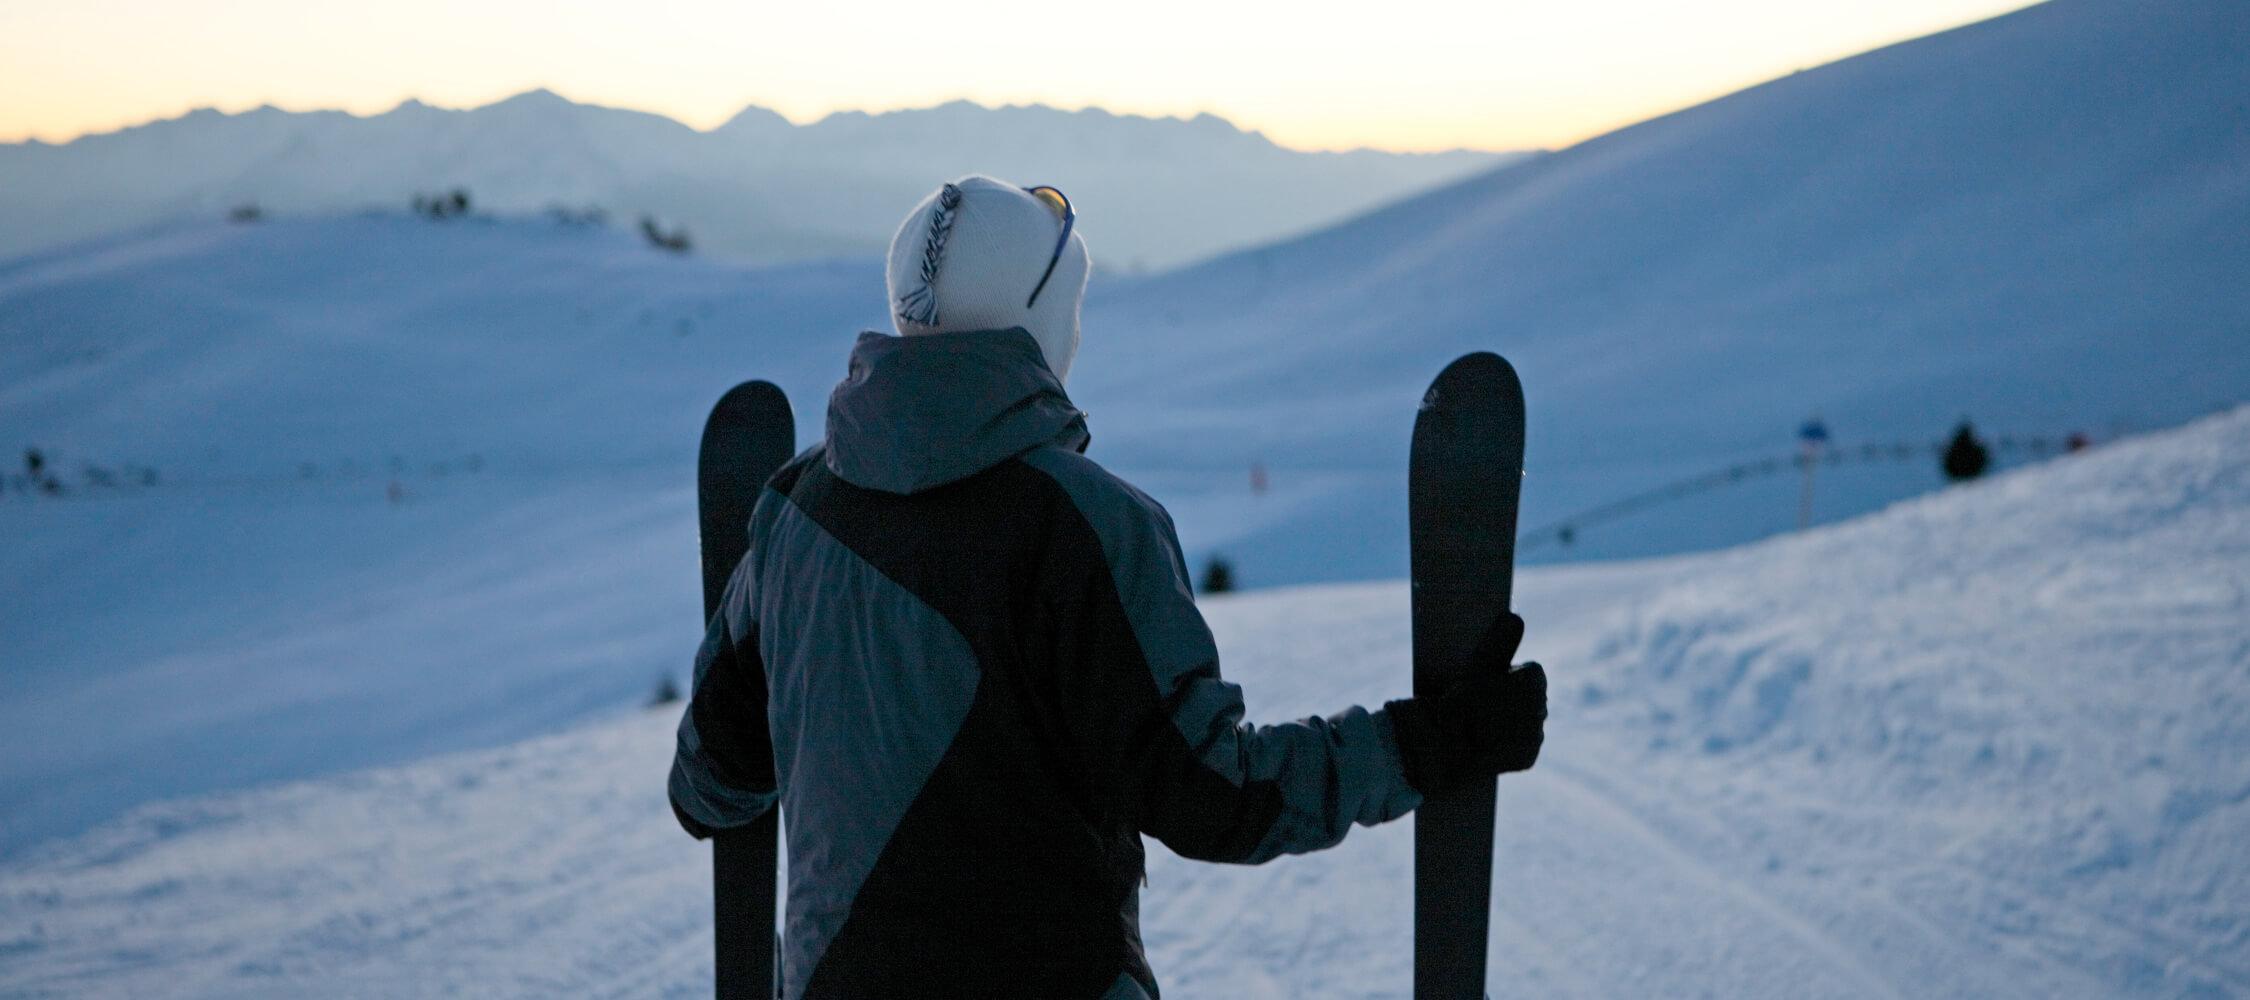 Italien-Trentino_Suedtirol_Alto_Adige_Merano_Meran_Natur_Sport_Winter_Schnee_Ski_Panorama_Berge_MGM-Frieder-Blickle_mgm00343frbl_2250x1000